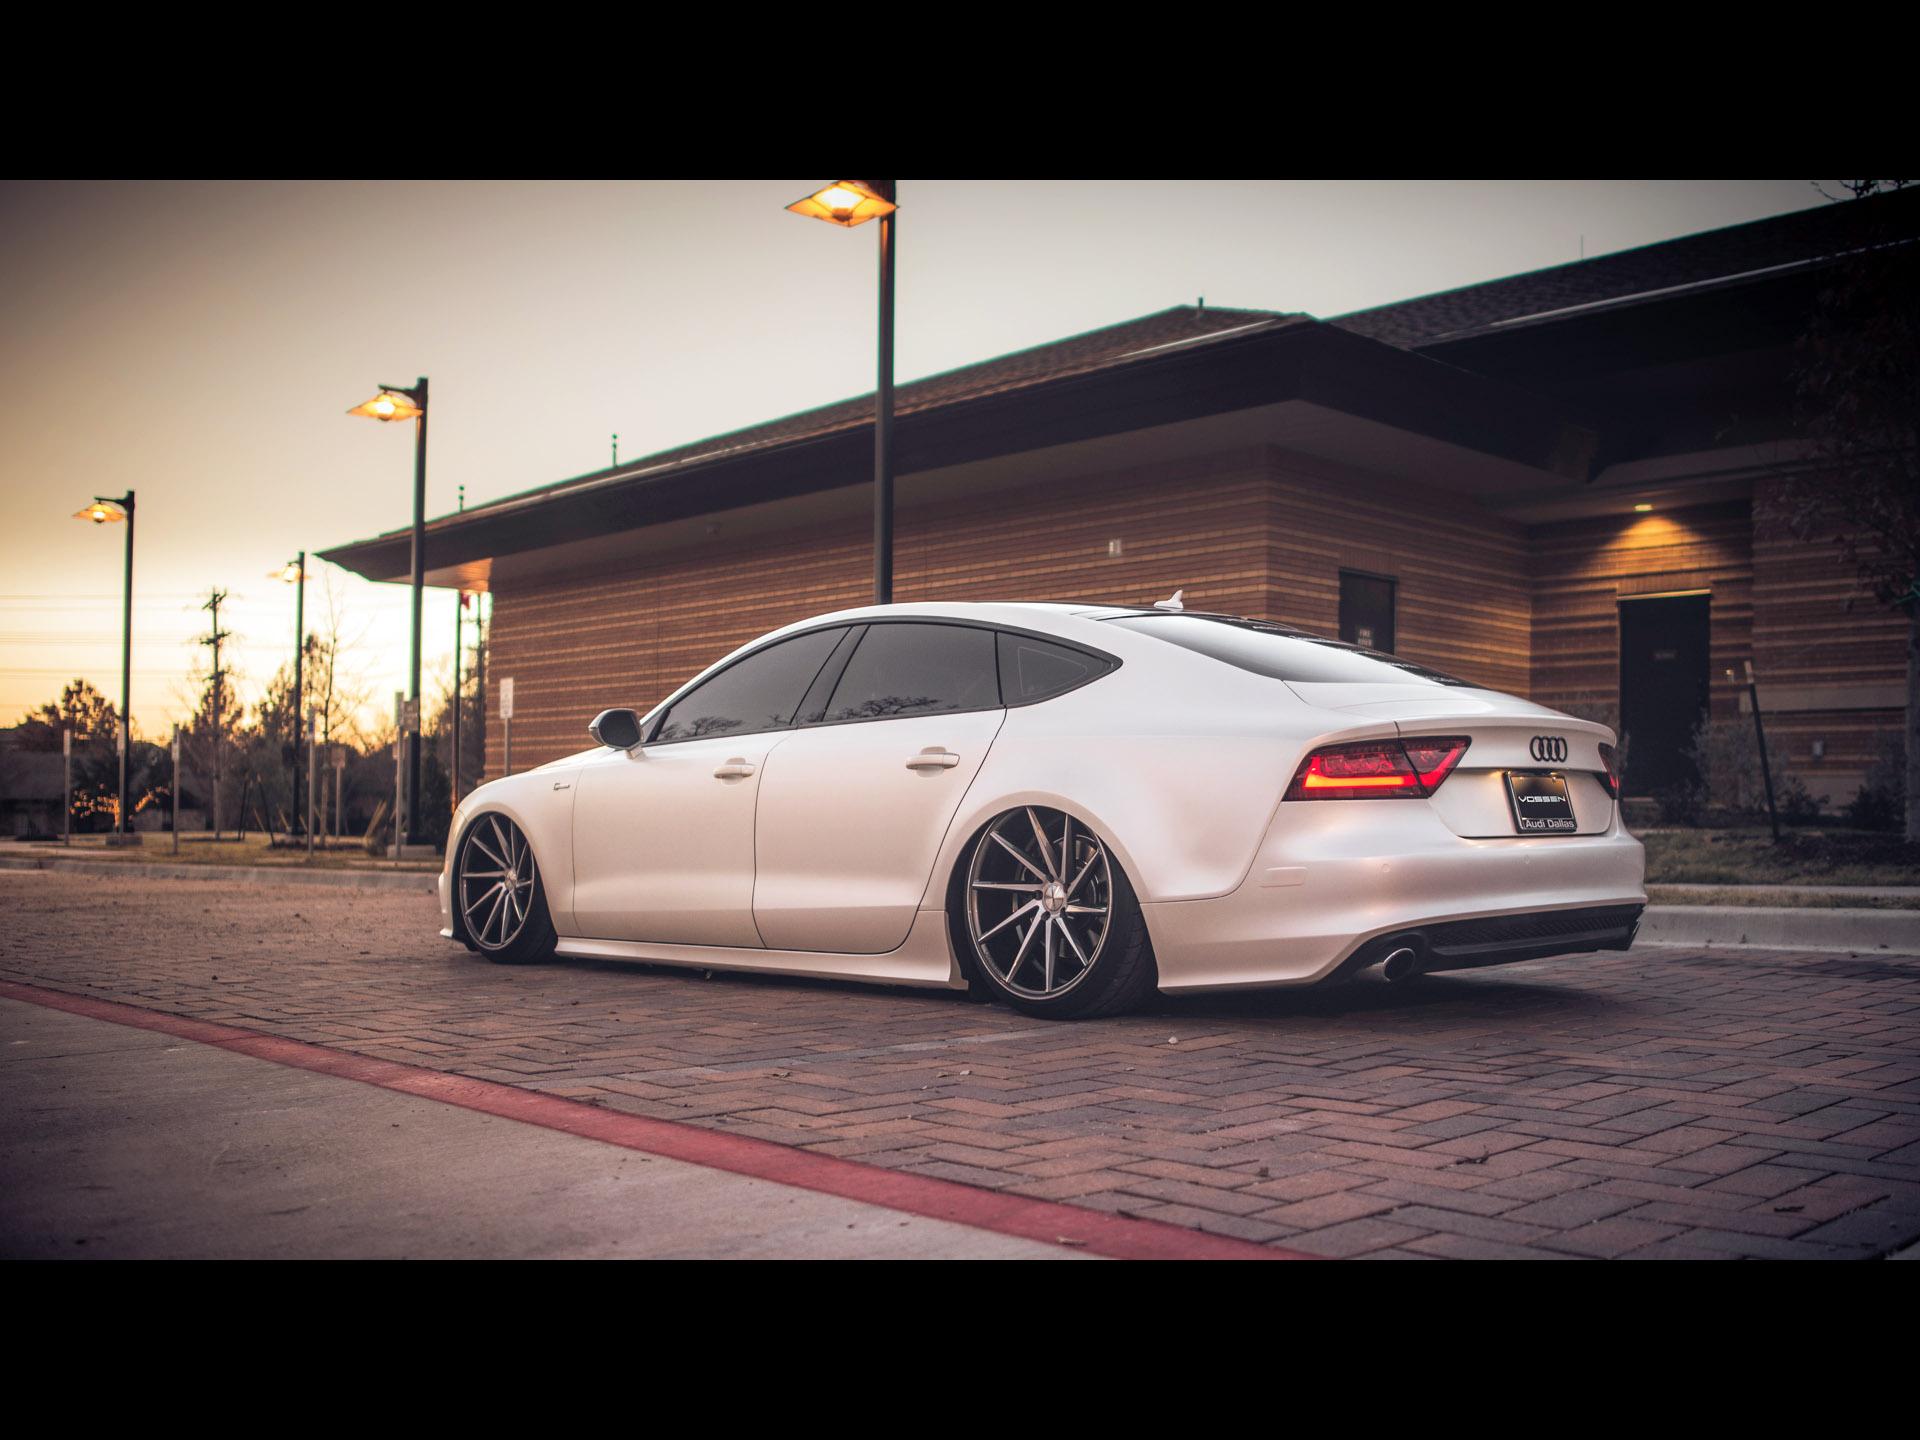 Vossen Wheels Audi A7 Sportback S Line 2014 アウディに嵌まる